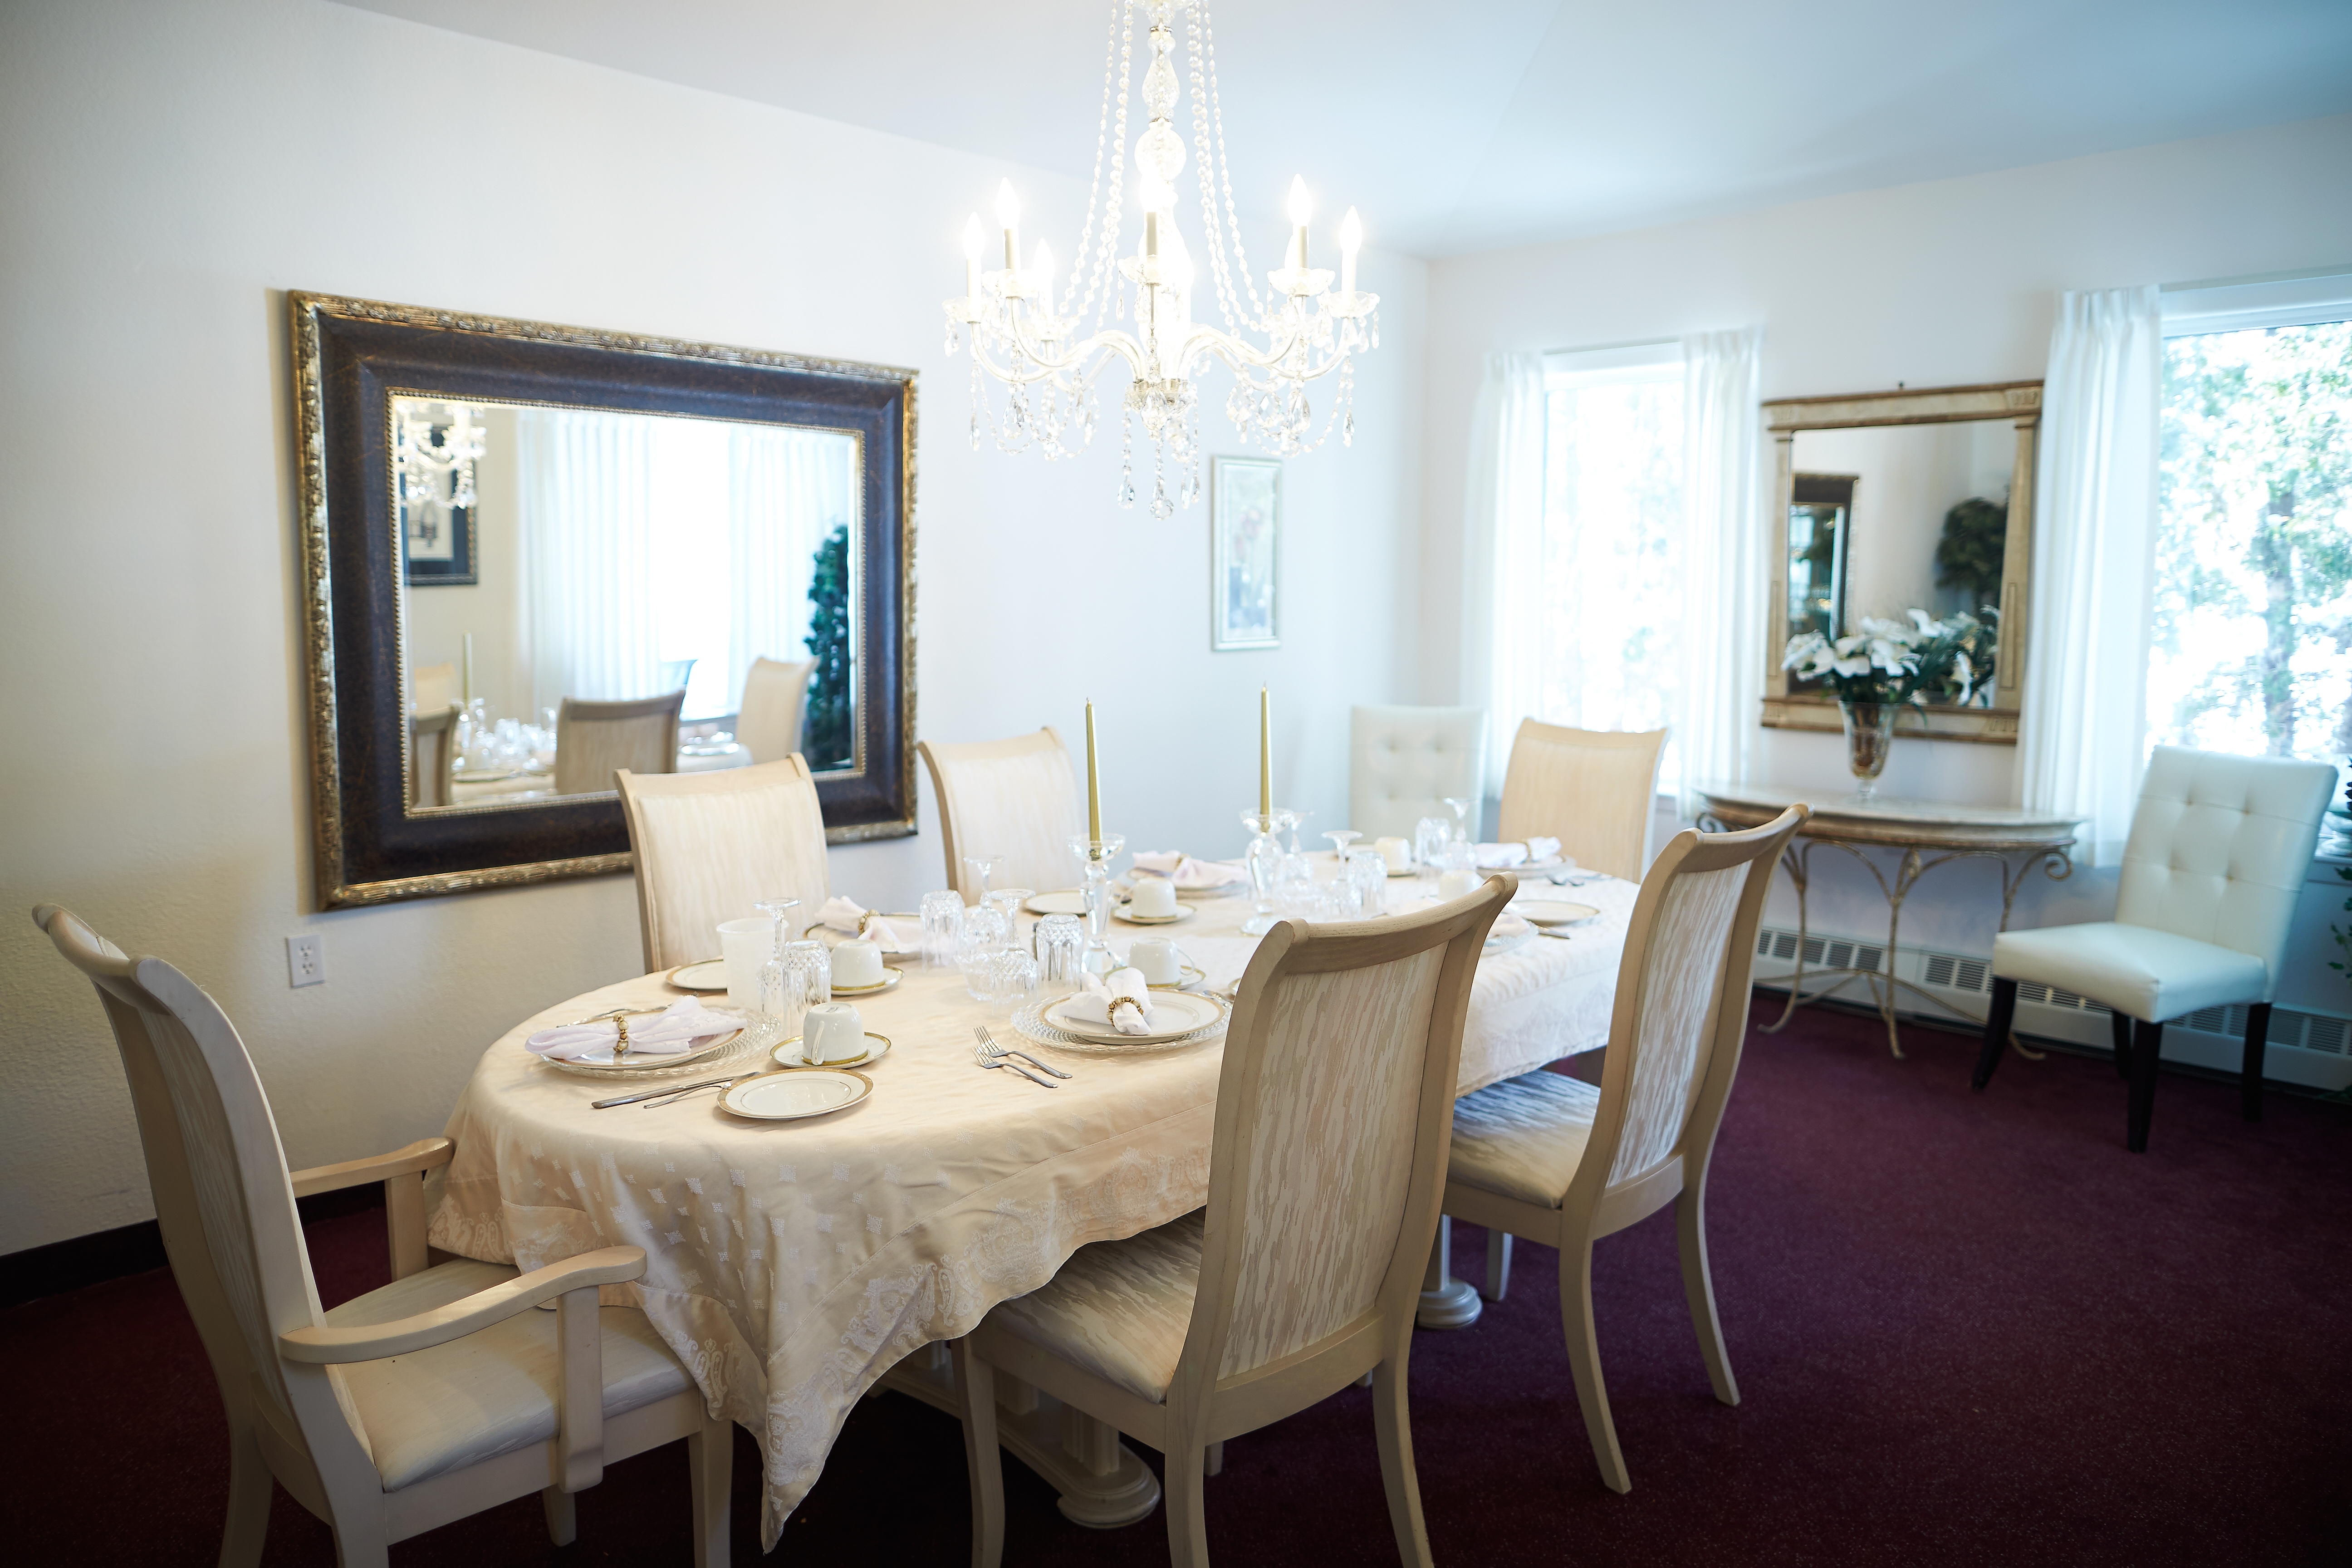 Dining area at Kensington Court Retirement Residence in Windsor